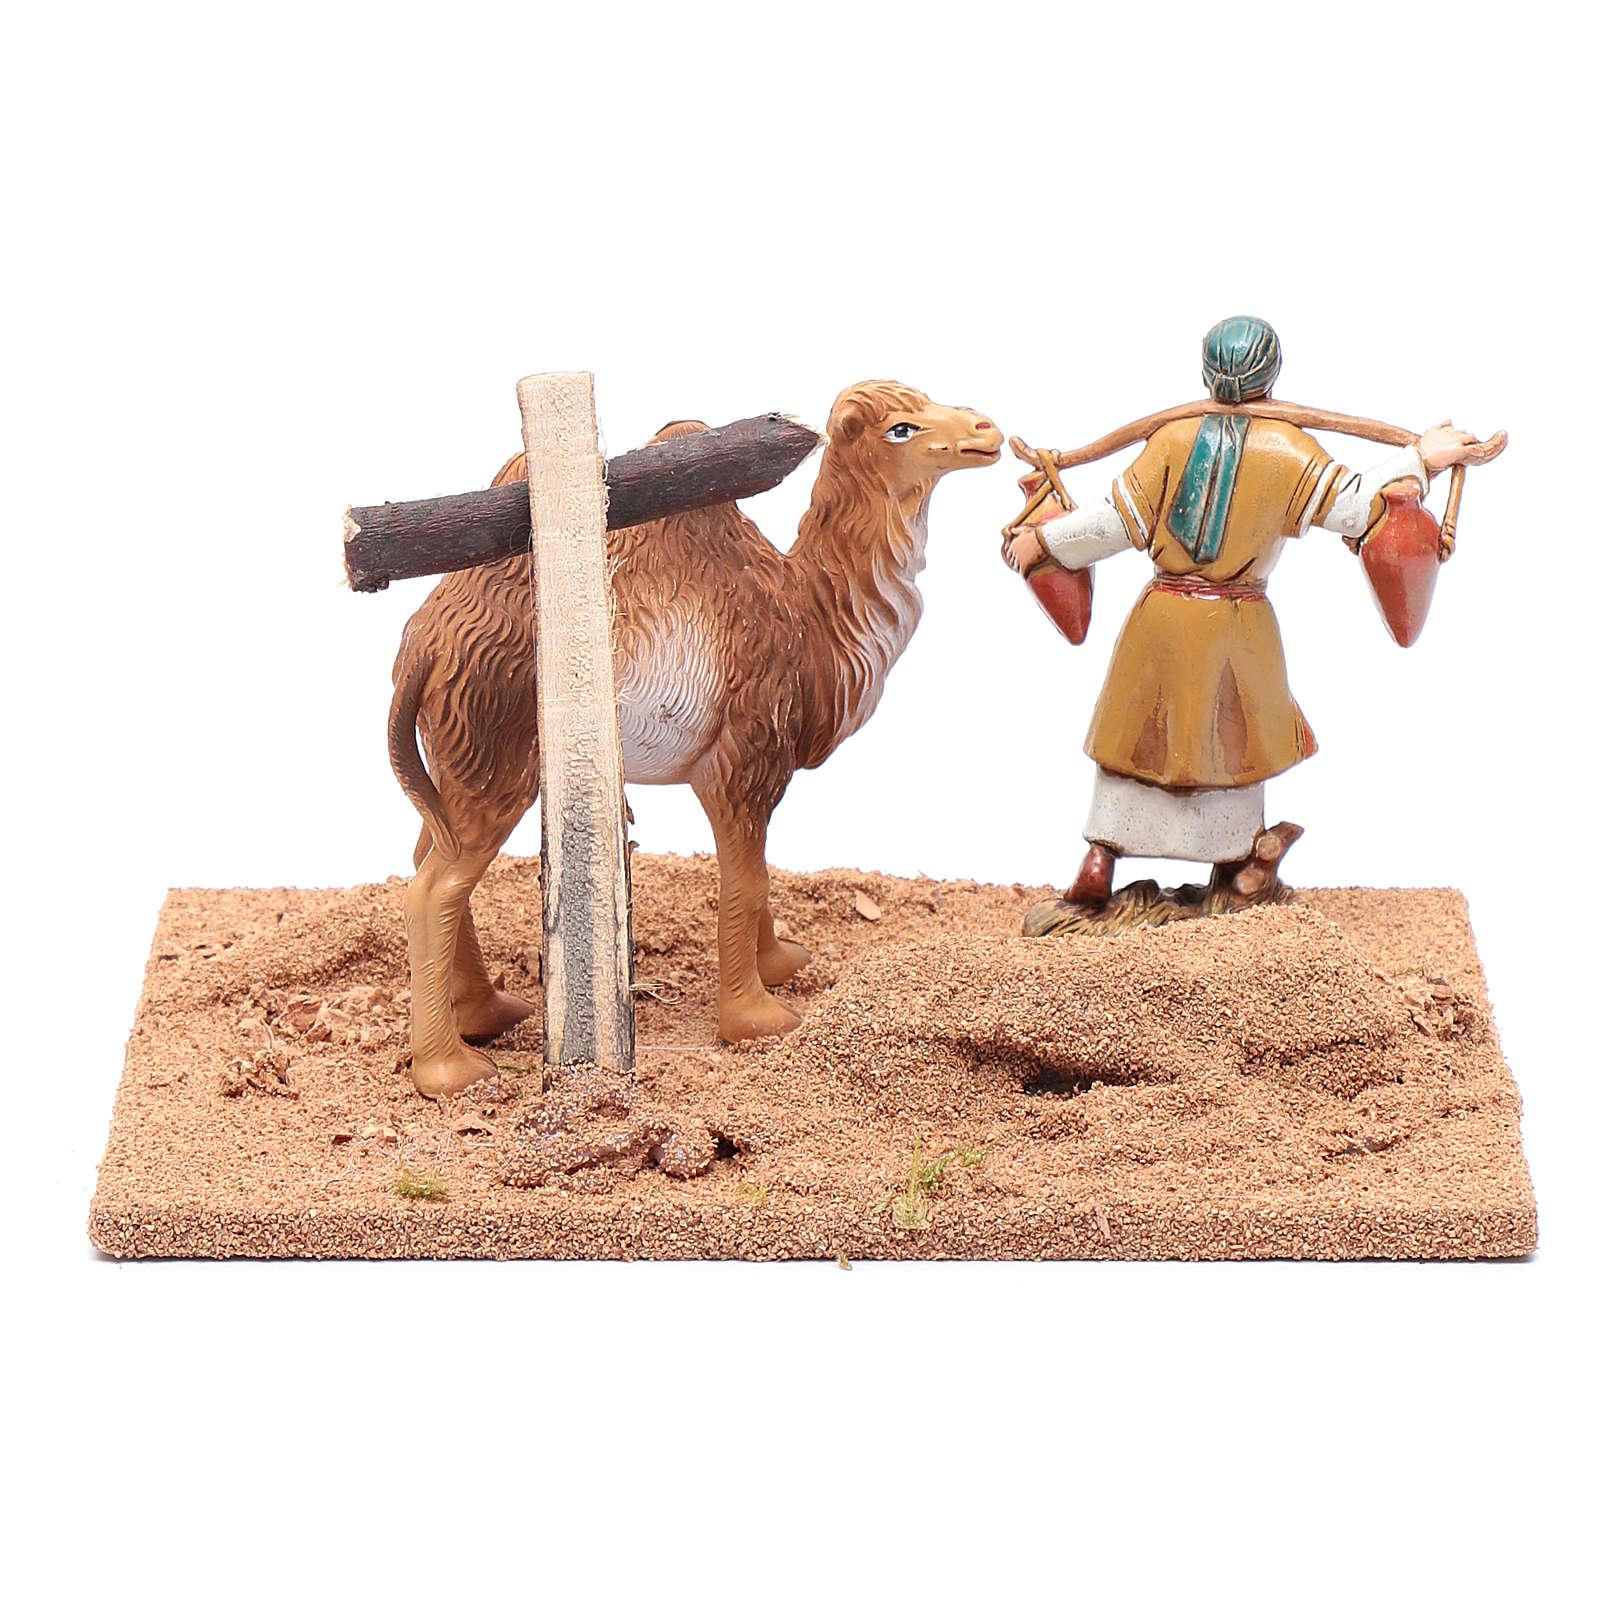 Pilgrim with camel 10x20x15 cm 3